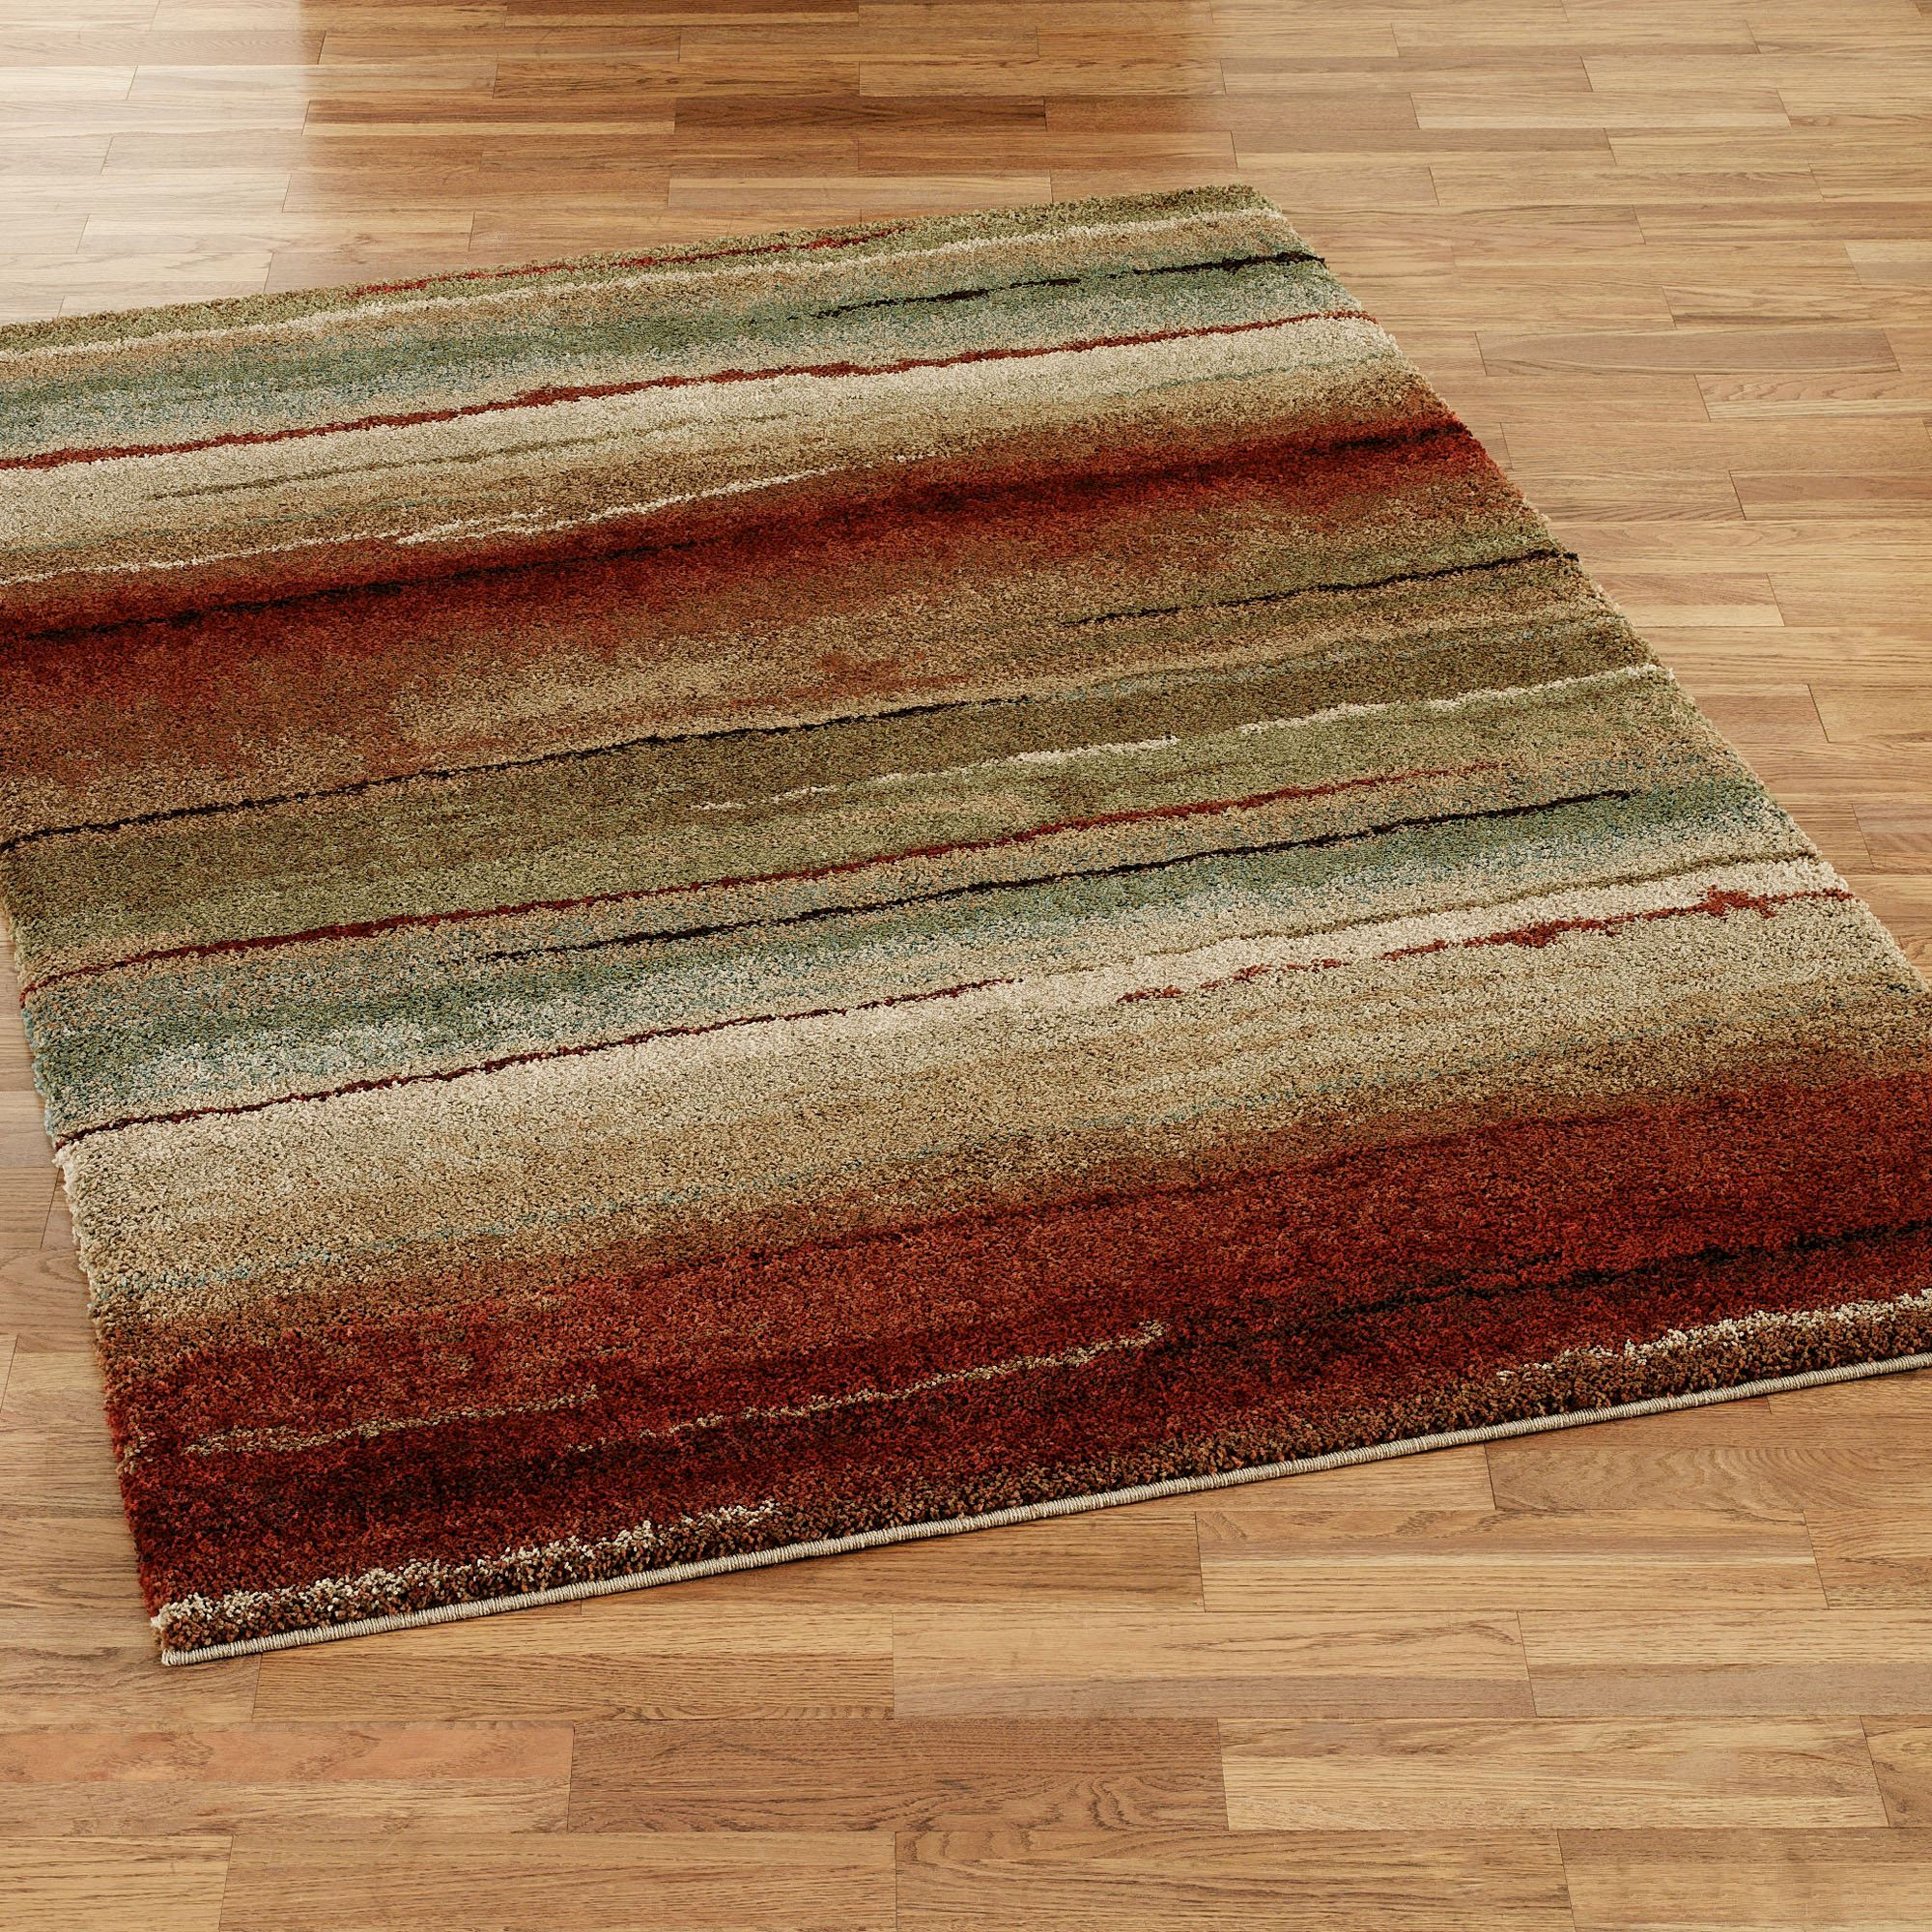 shag area rug dusk to dawn rectangle rug multi jewel JGWXZKM